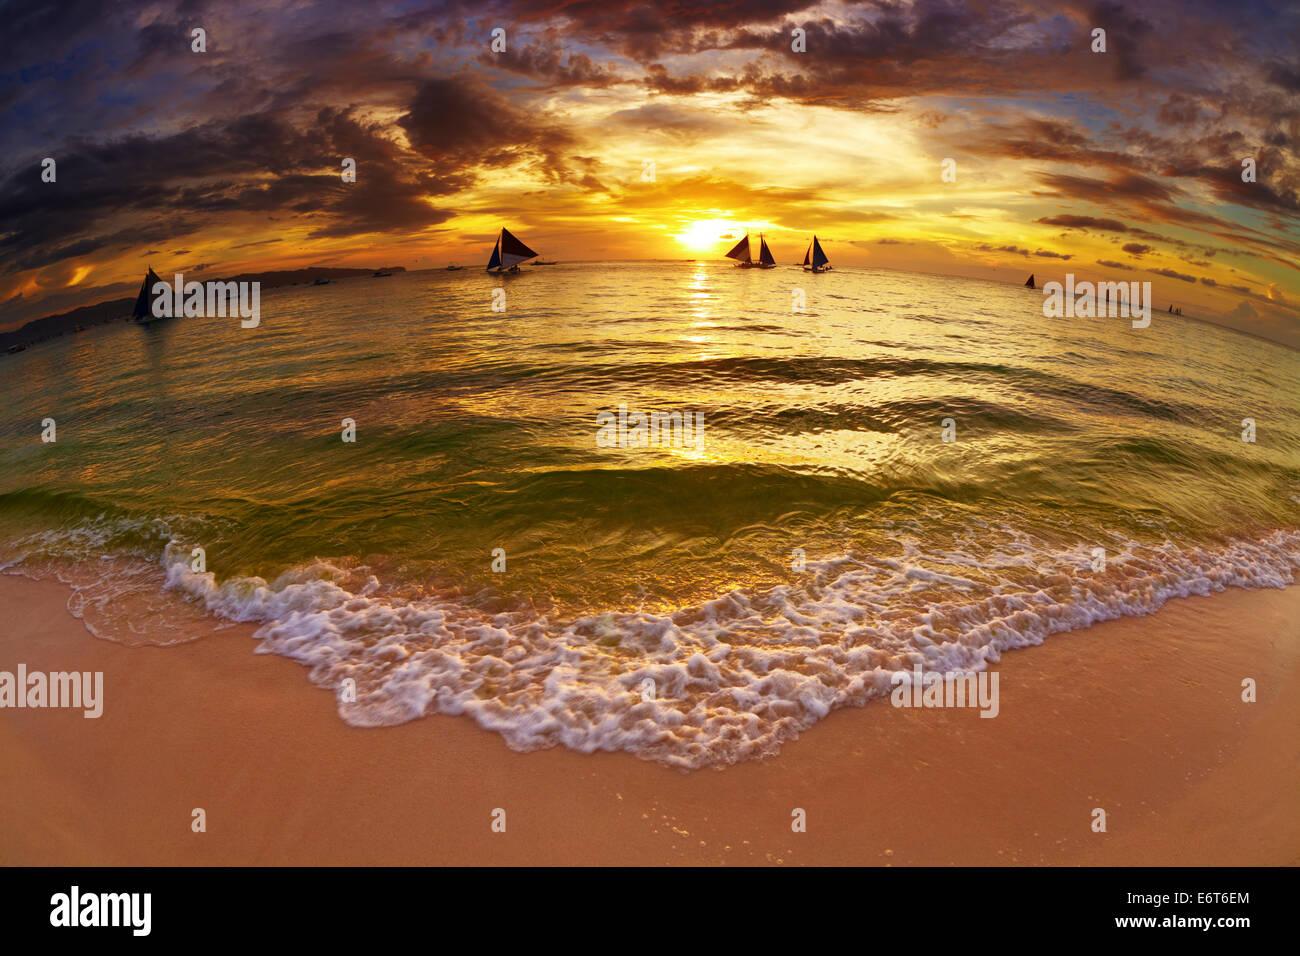 Tropischer Strand bei Sonnenuntergang, Boracay Island, Philippinen, fisheye erschossen Stockbild